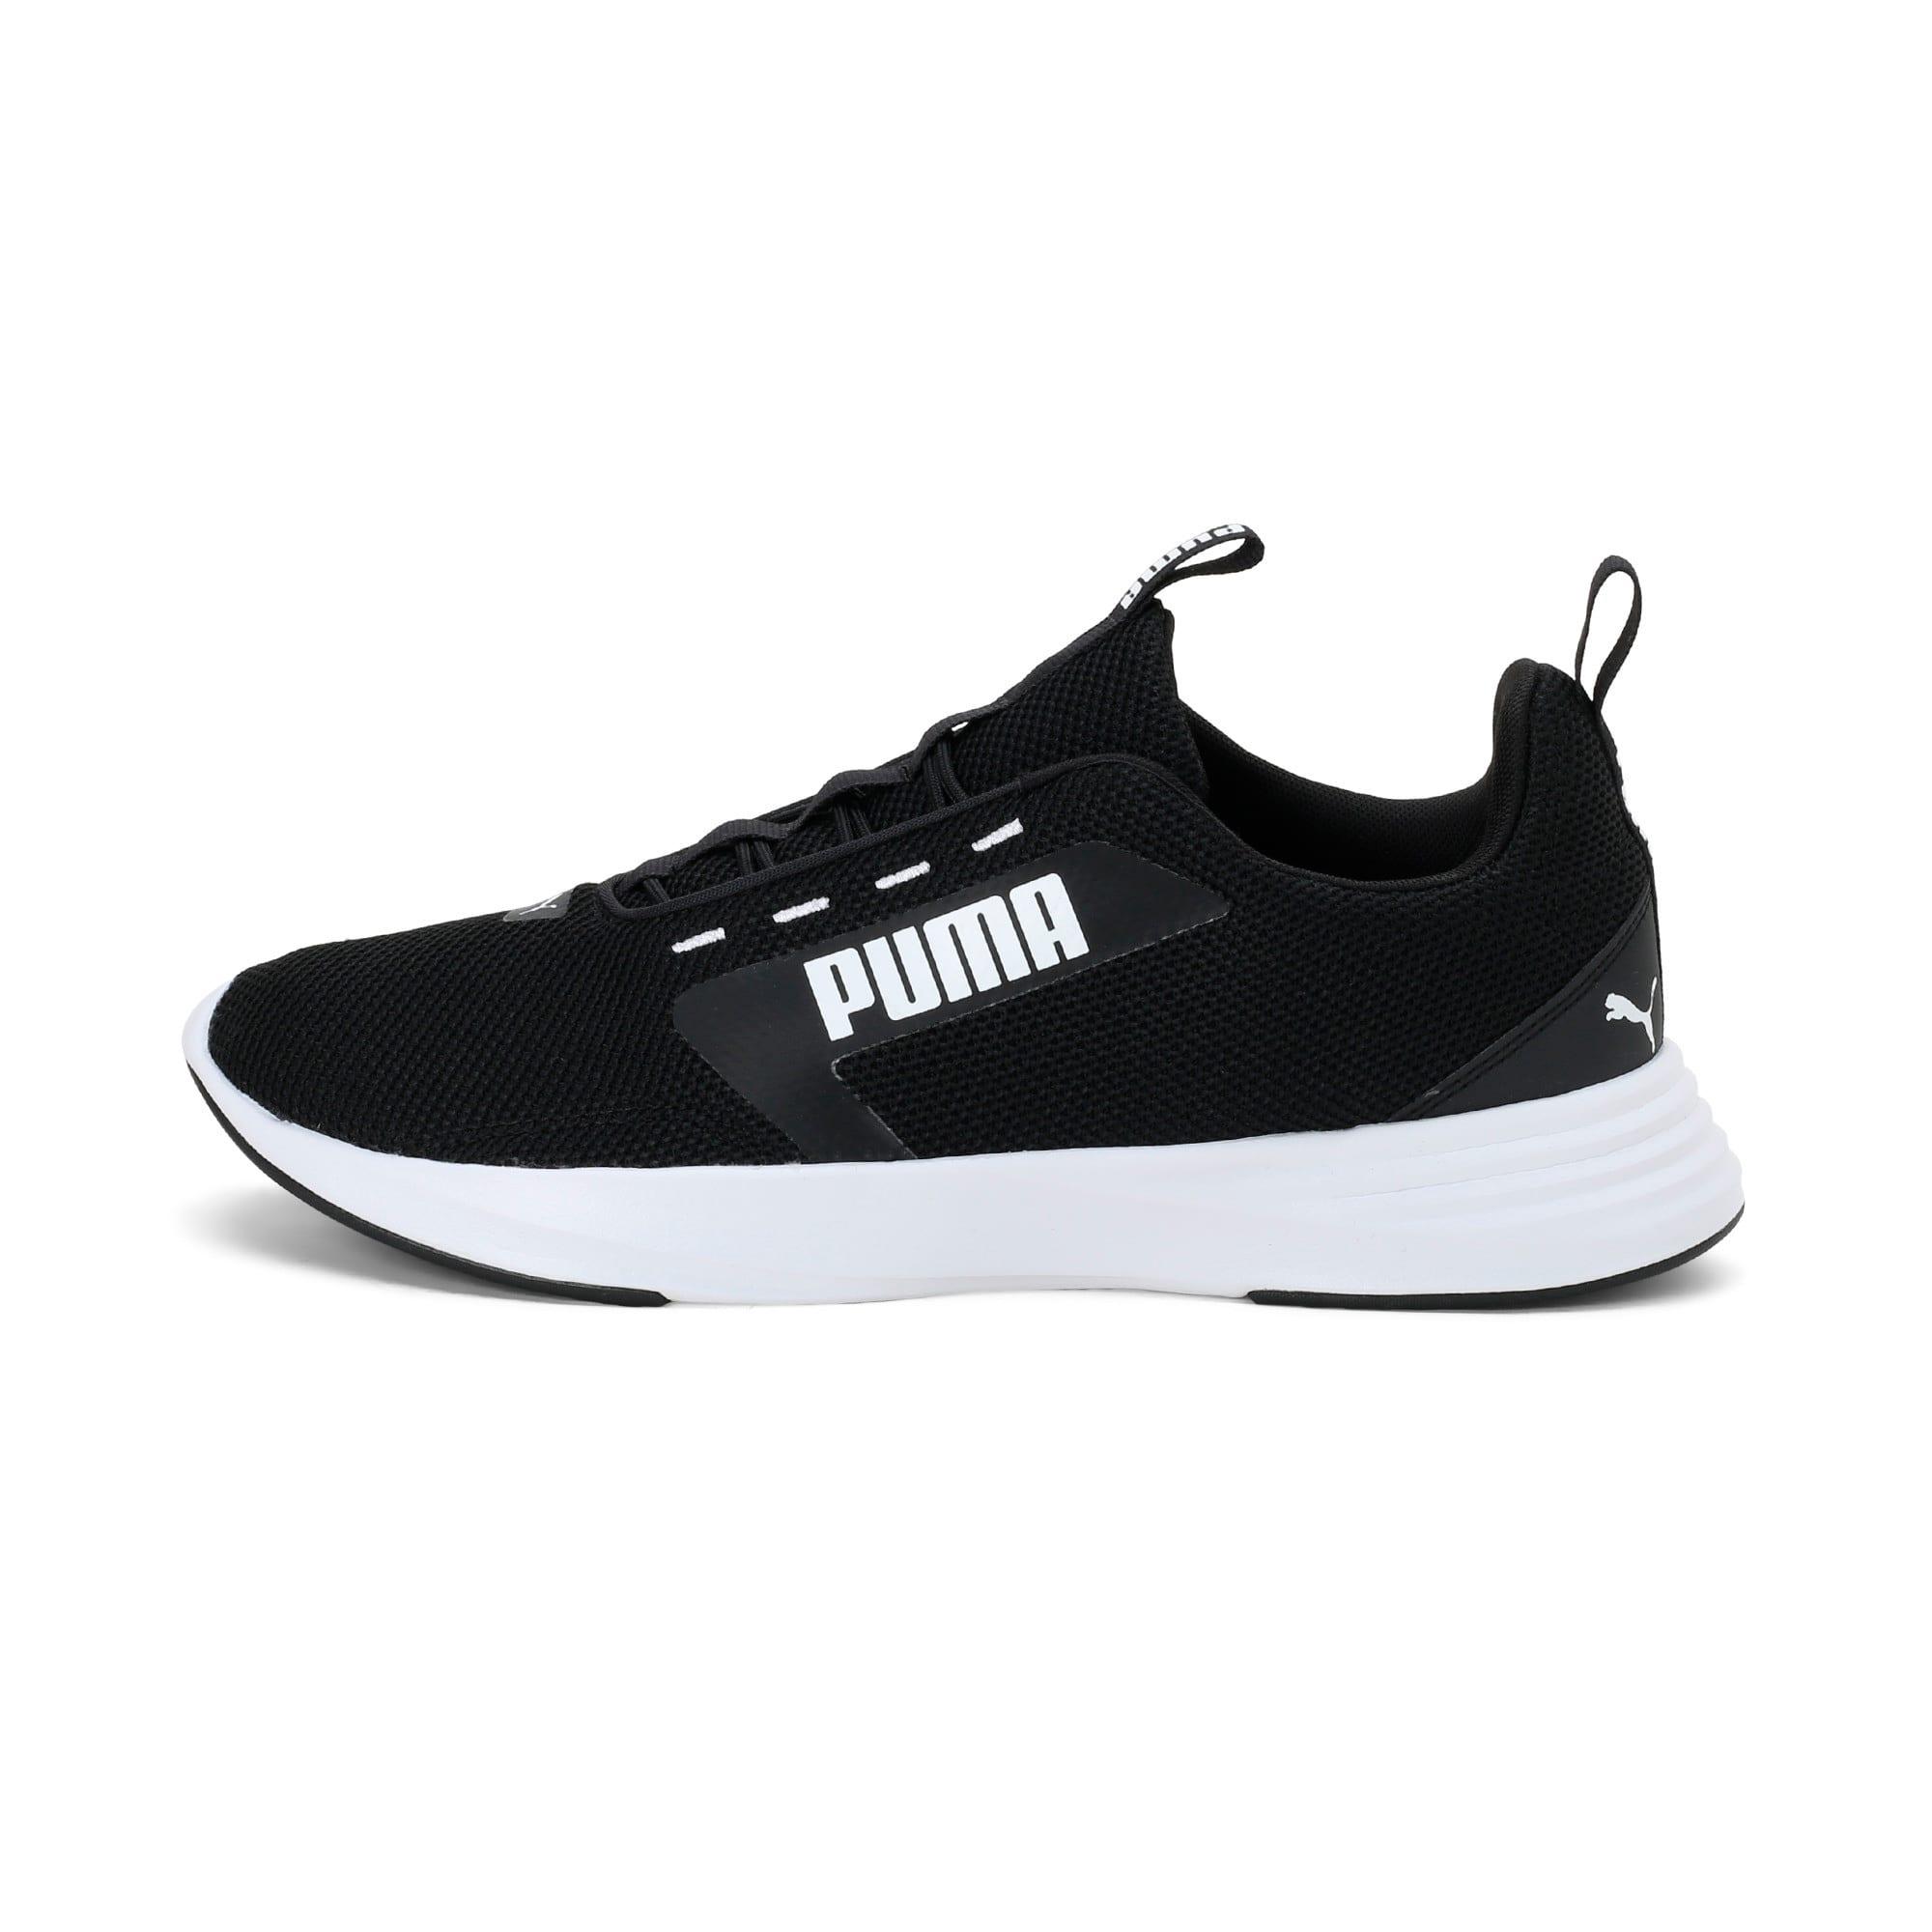 Thumbnail 1 of Extractor Running Shoes, Puma Black-Puma White, medium-IND